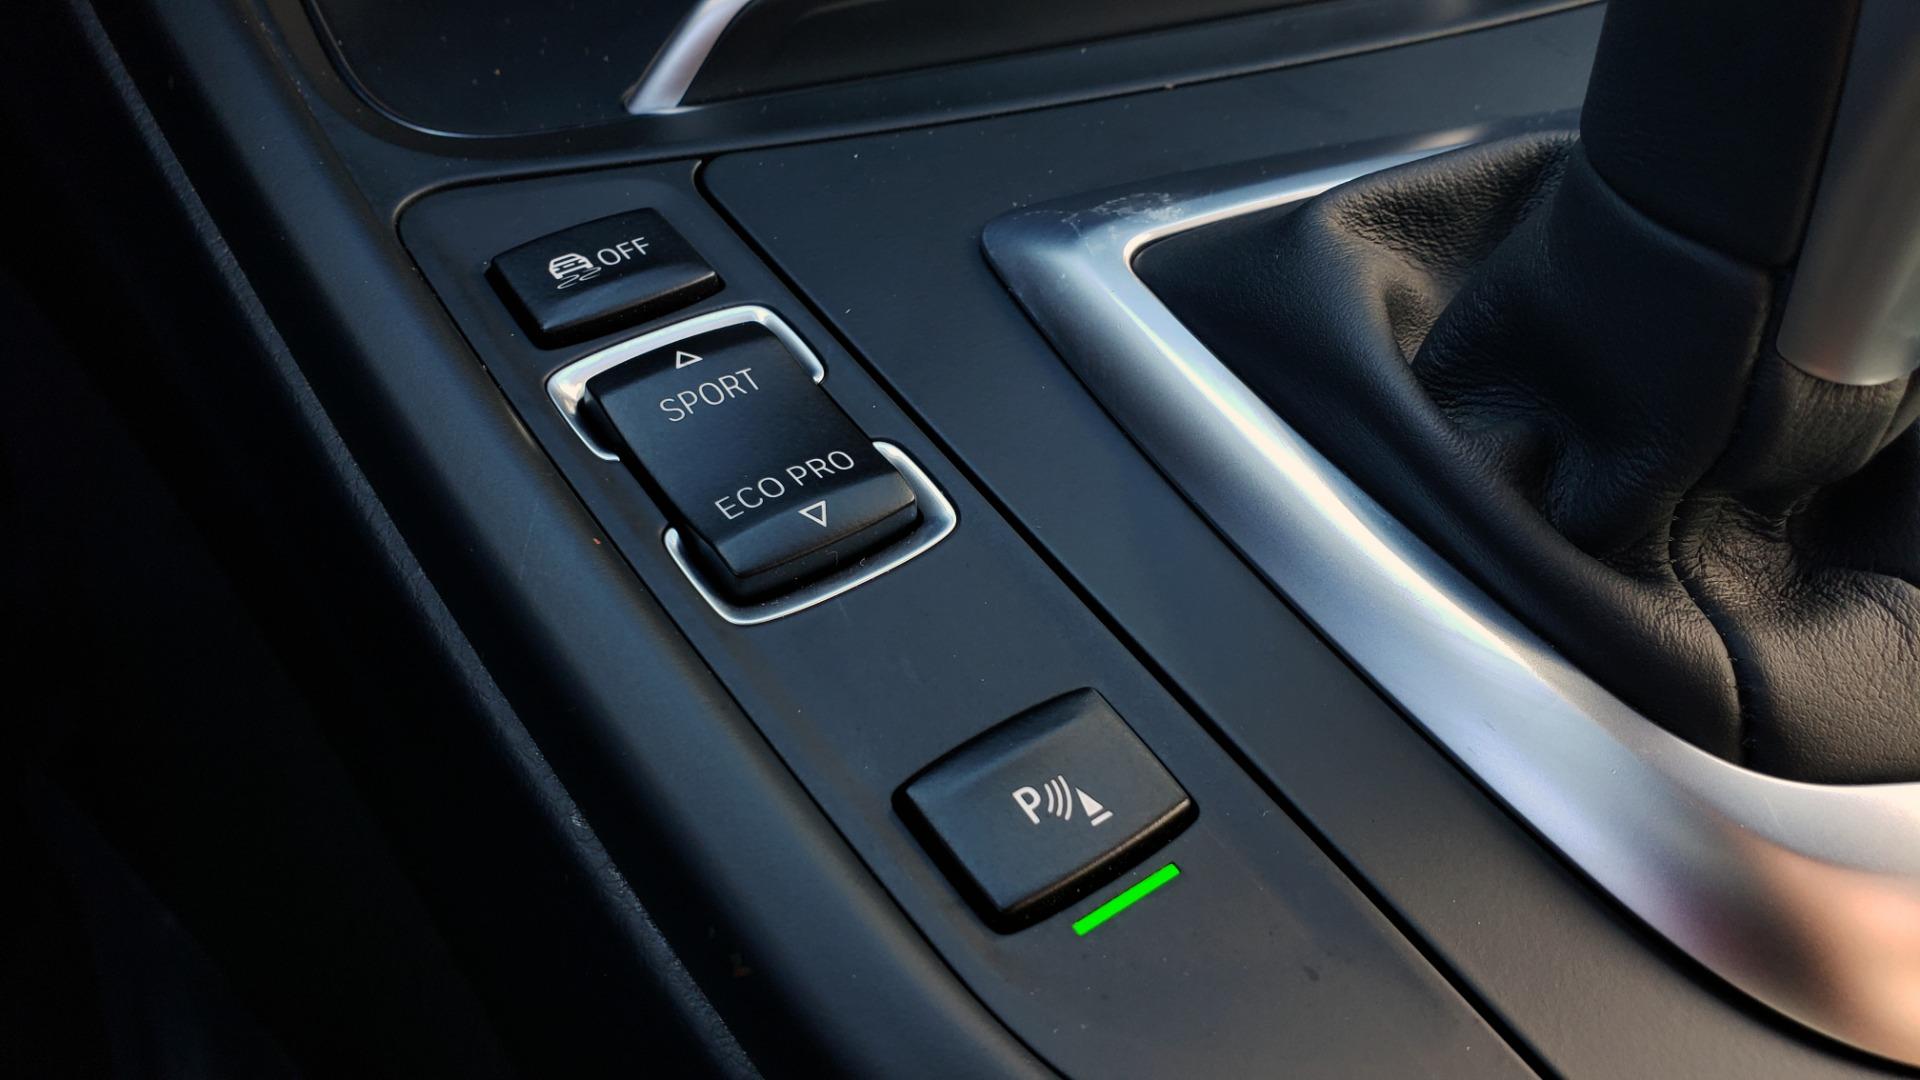 Used 2018 BMW 4 SERIES 430IXDRIVE / PREMIUM / NAV / SUNROOF / ESSENTIALS PKG for sale $27,795 at Formula Imports in Charlotte NC 28227 50